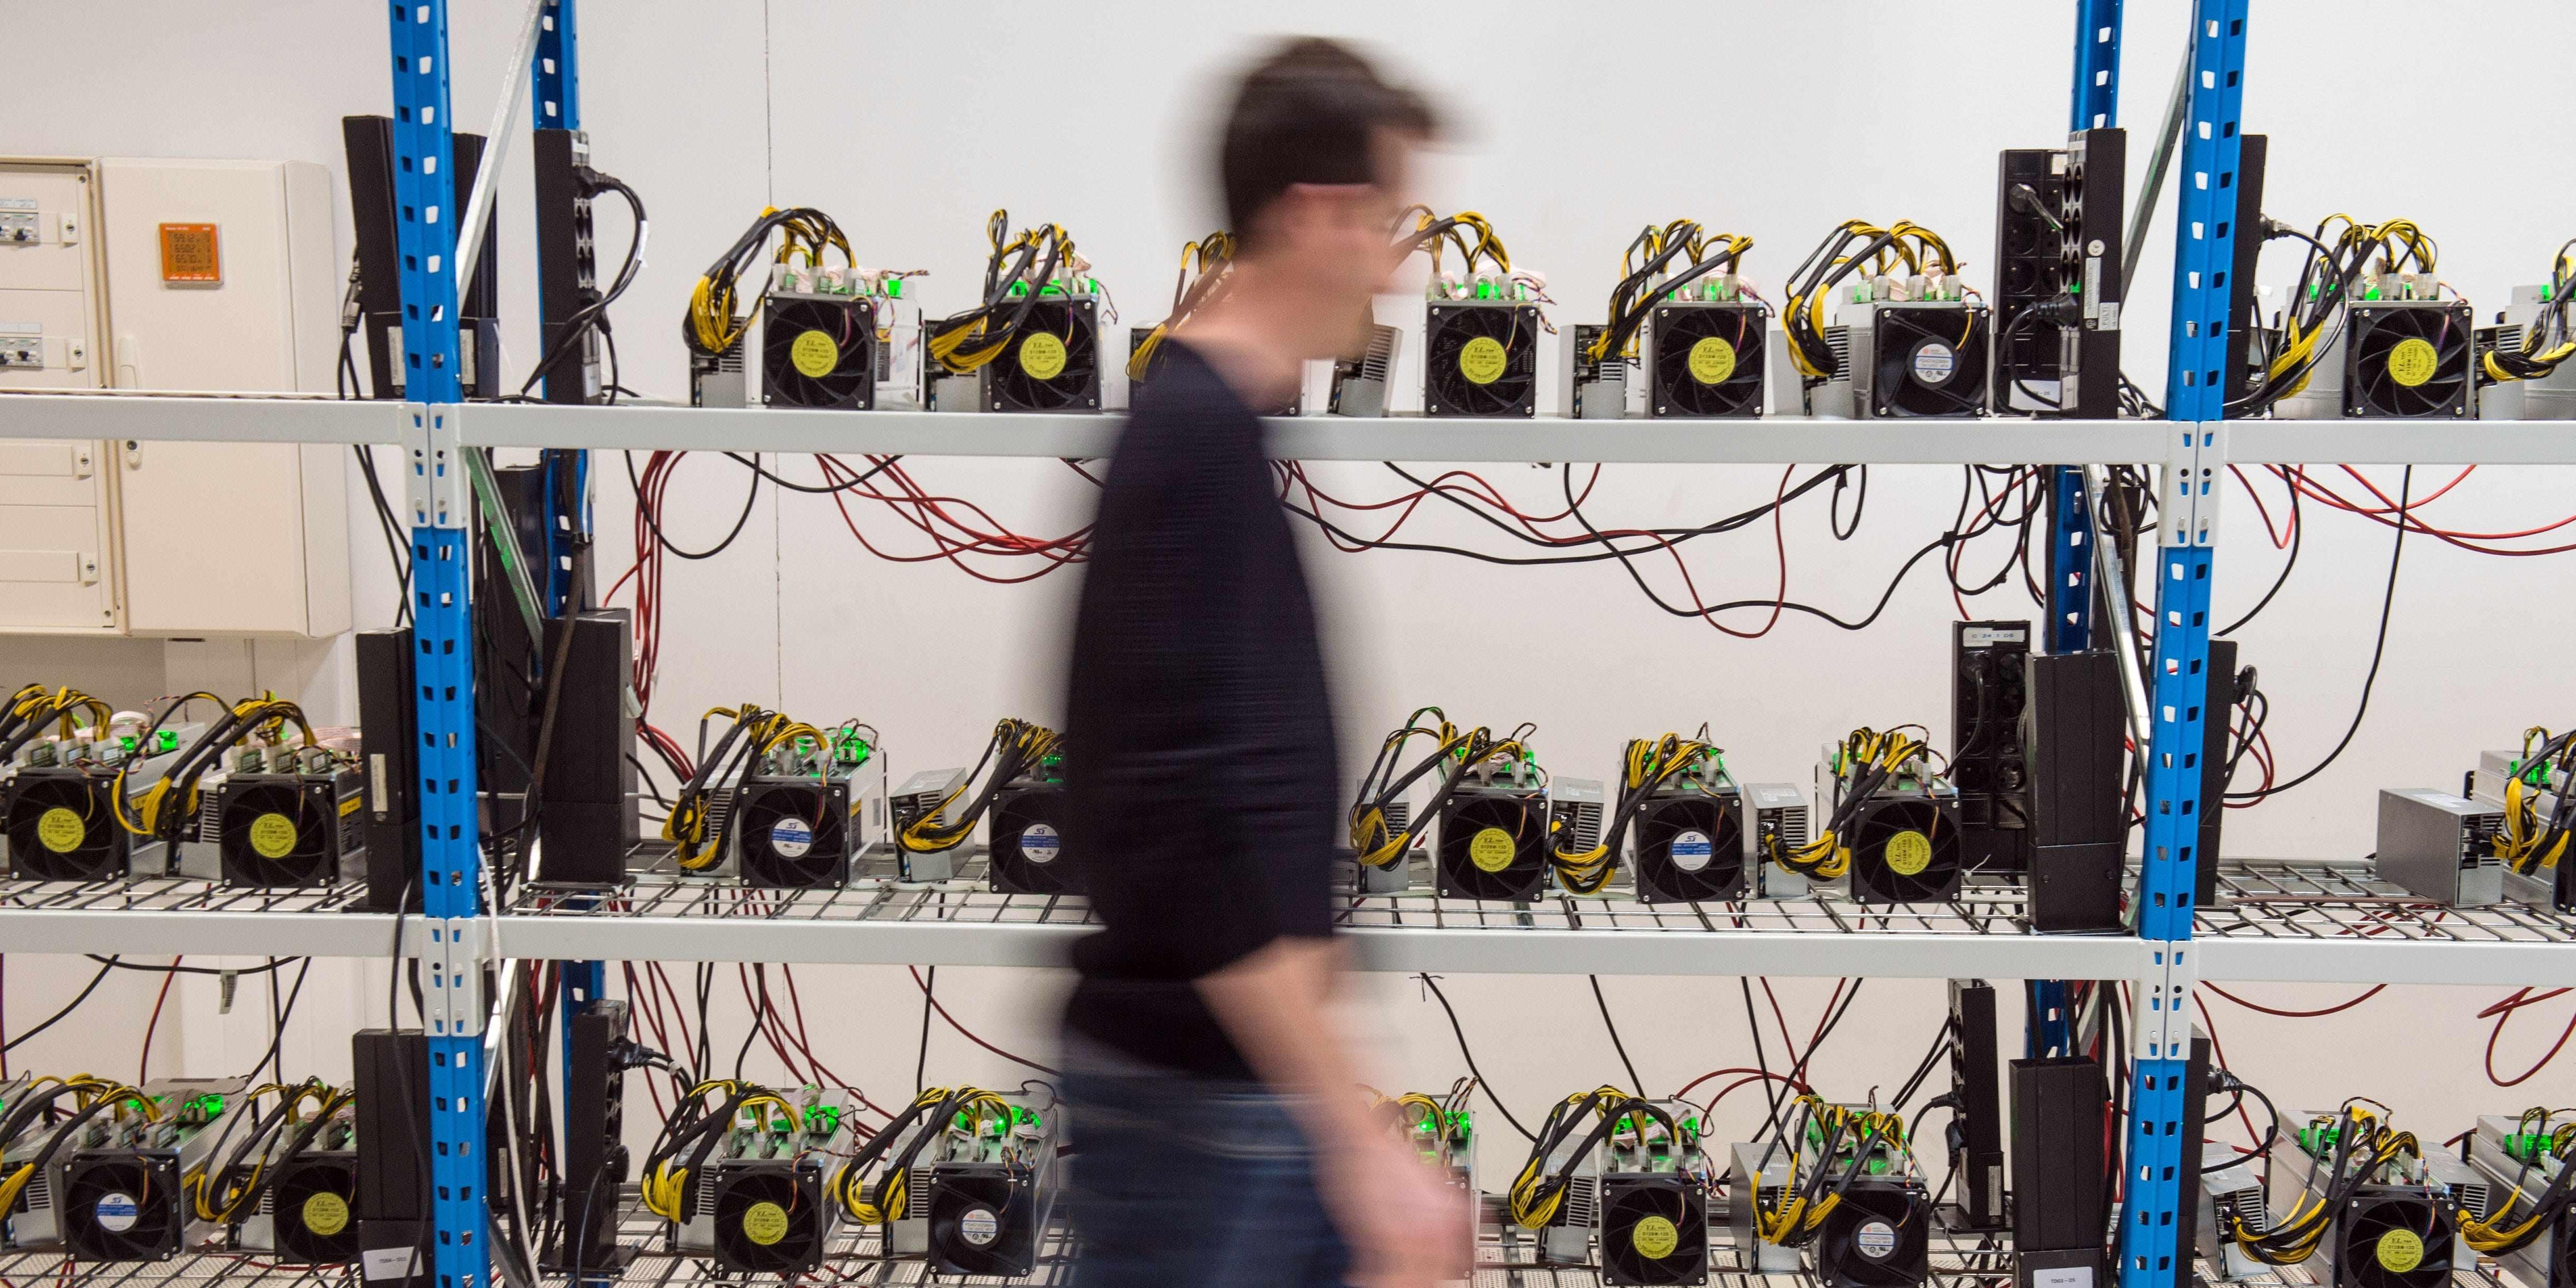 green cryptocurrency energy intensive method